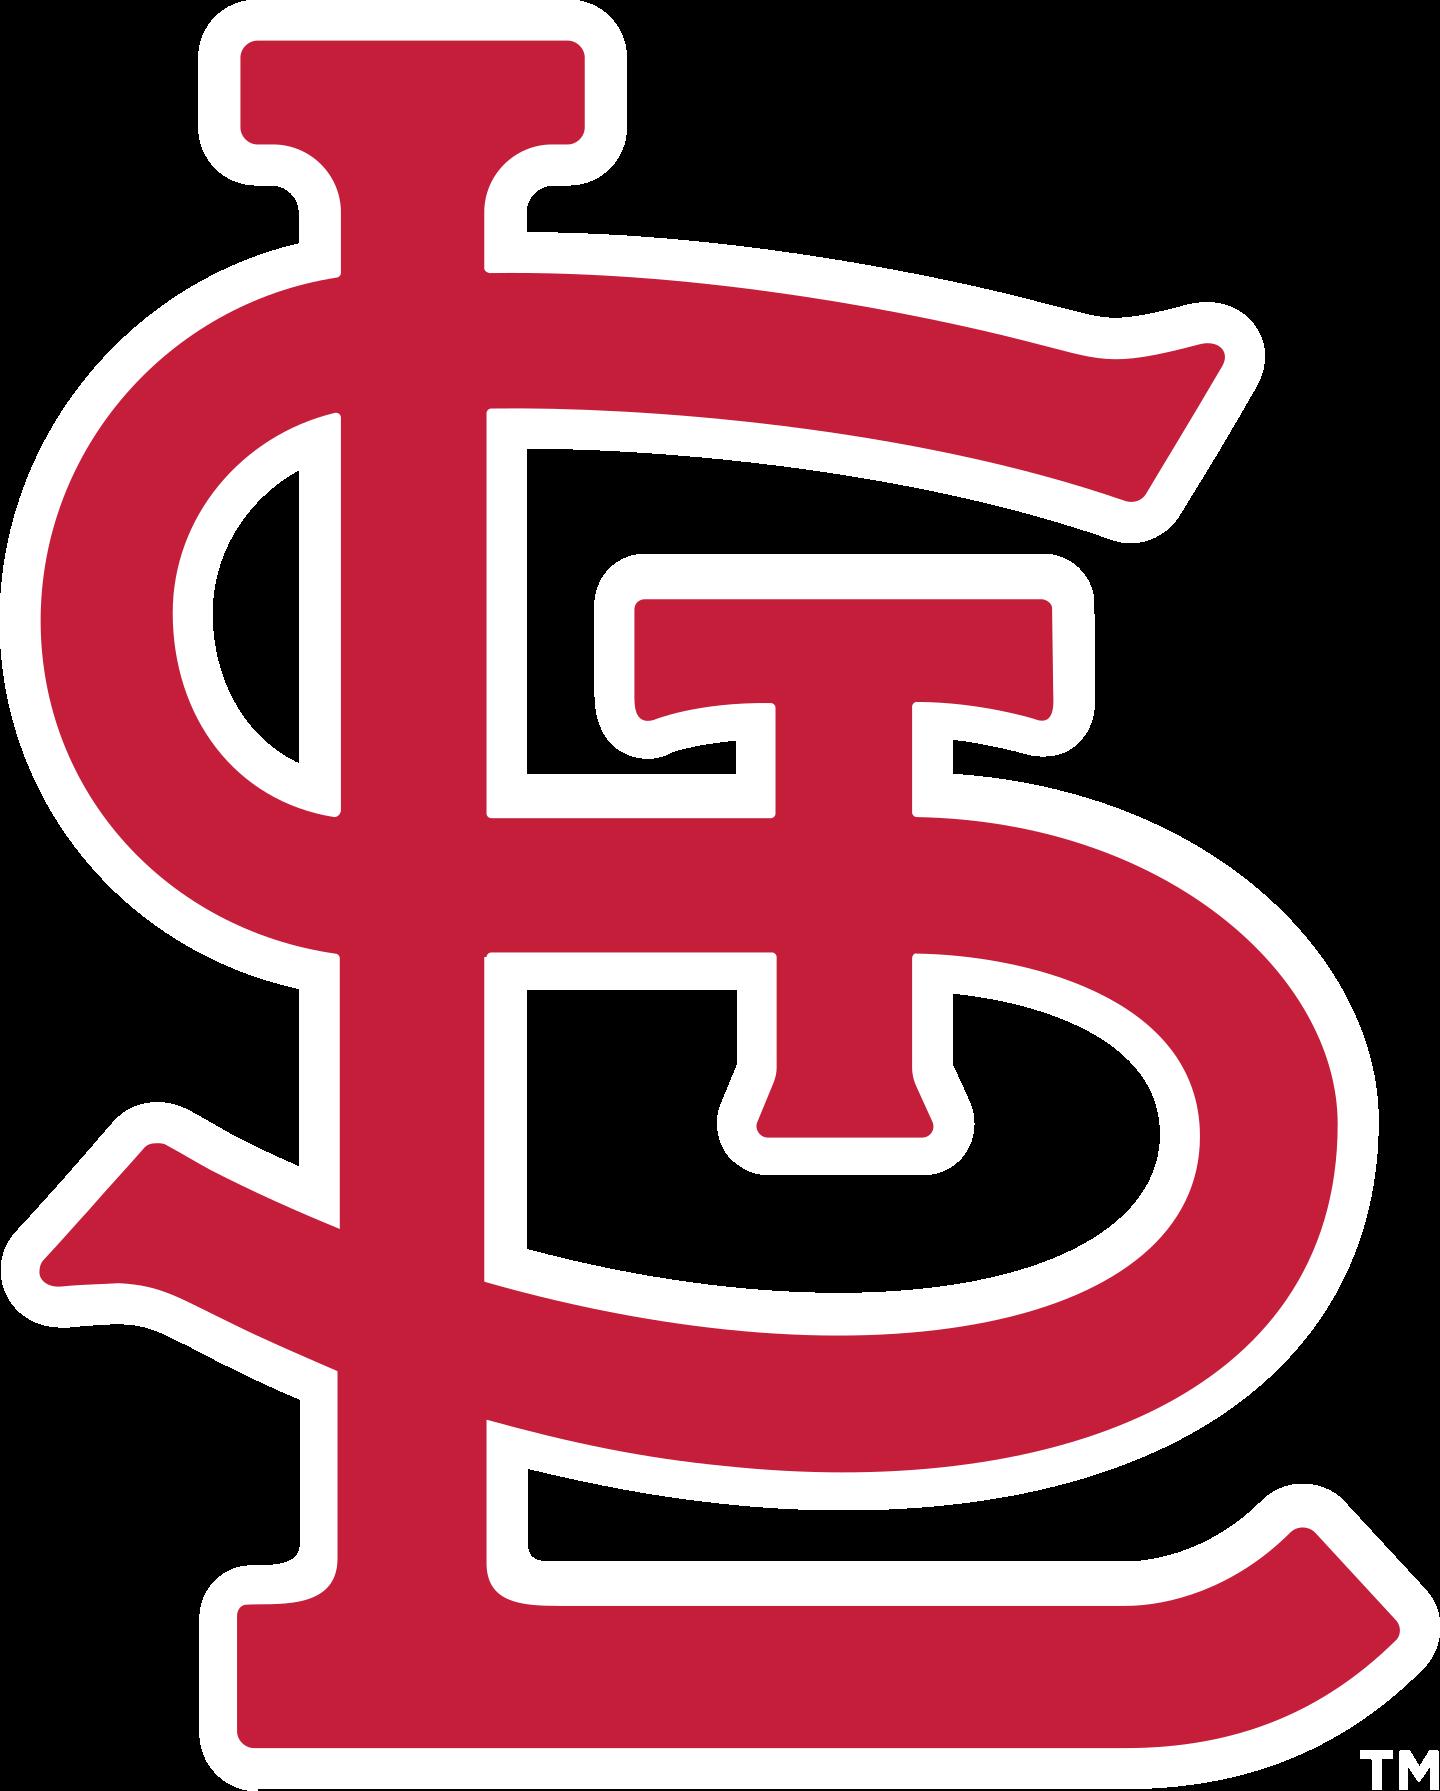 st louis cardinals logo 2 - St. Louis Cardinals Logo